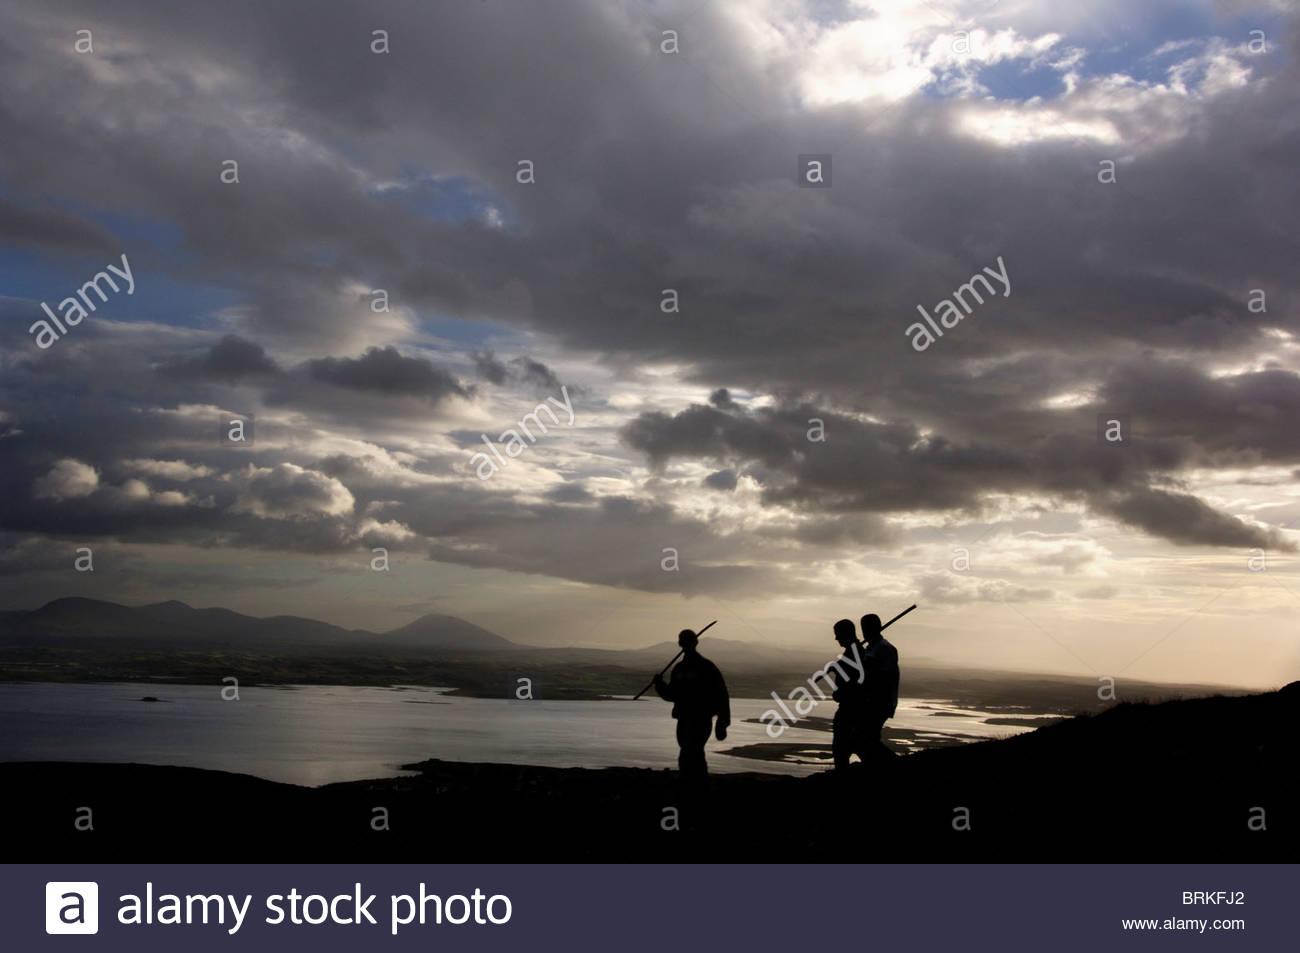 Pilgrims on the sacred mountain of Croagh Patrick - Stock Image